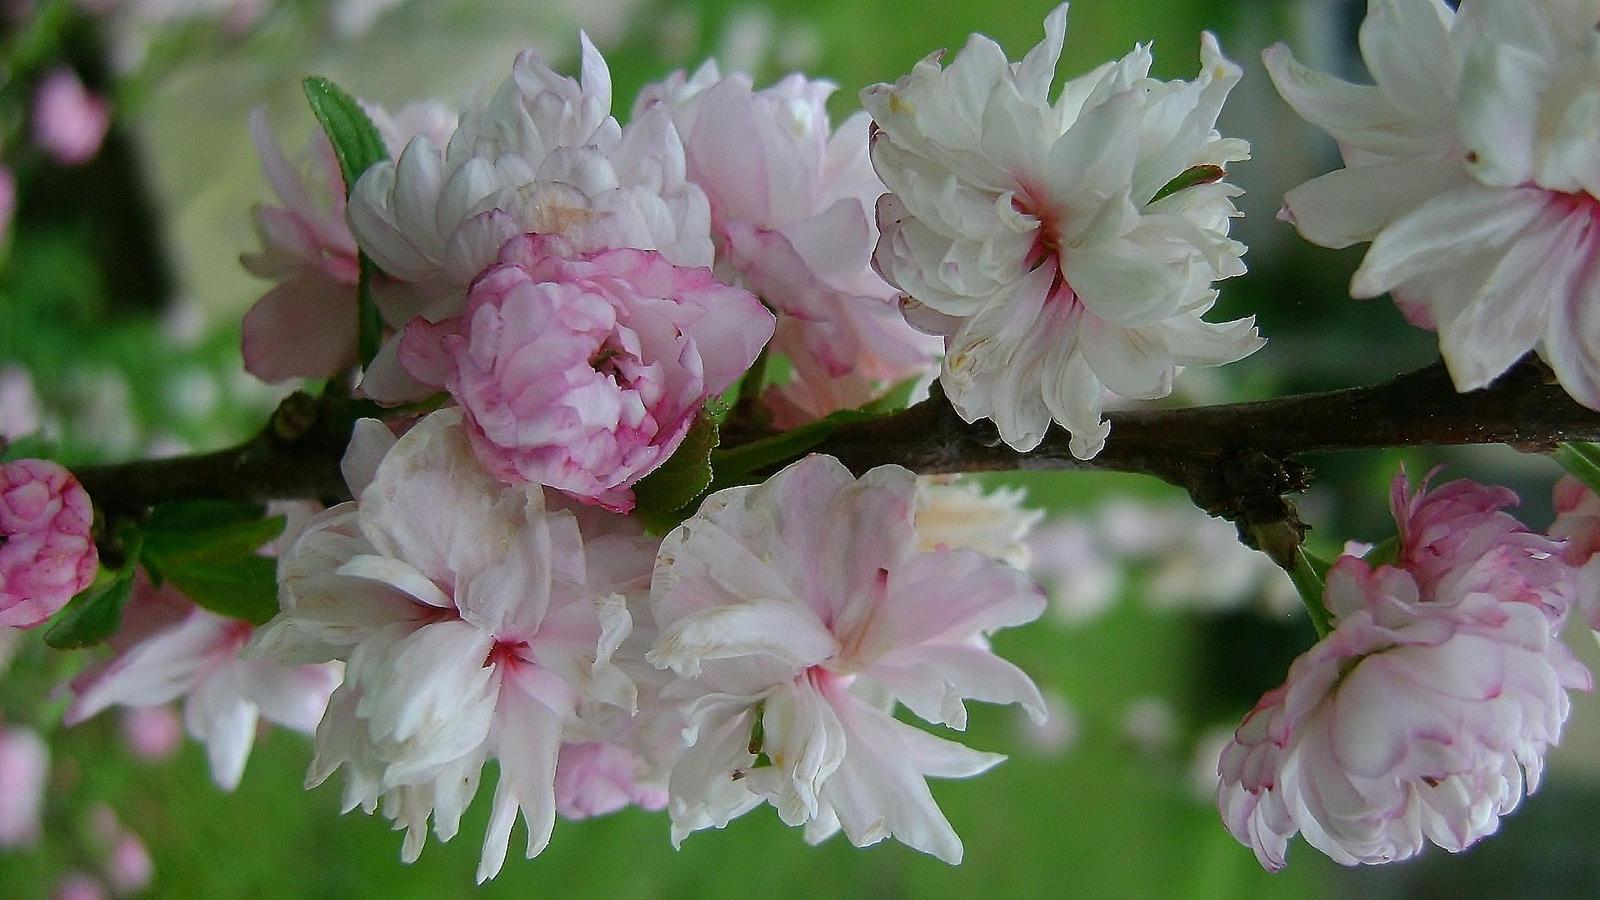 Flowering Almond Tree by phootyraskel on DeviantArt